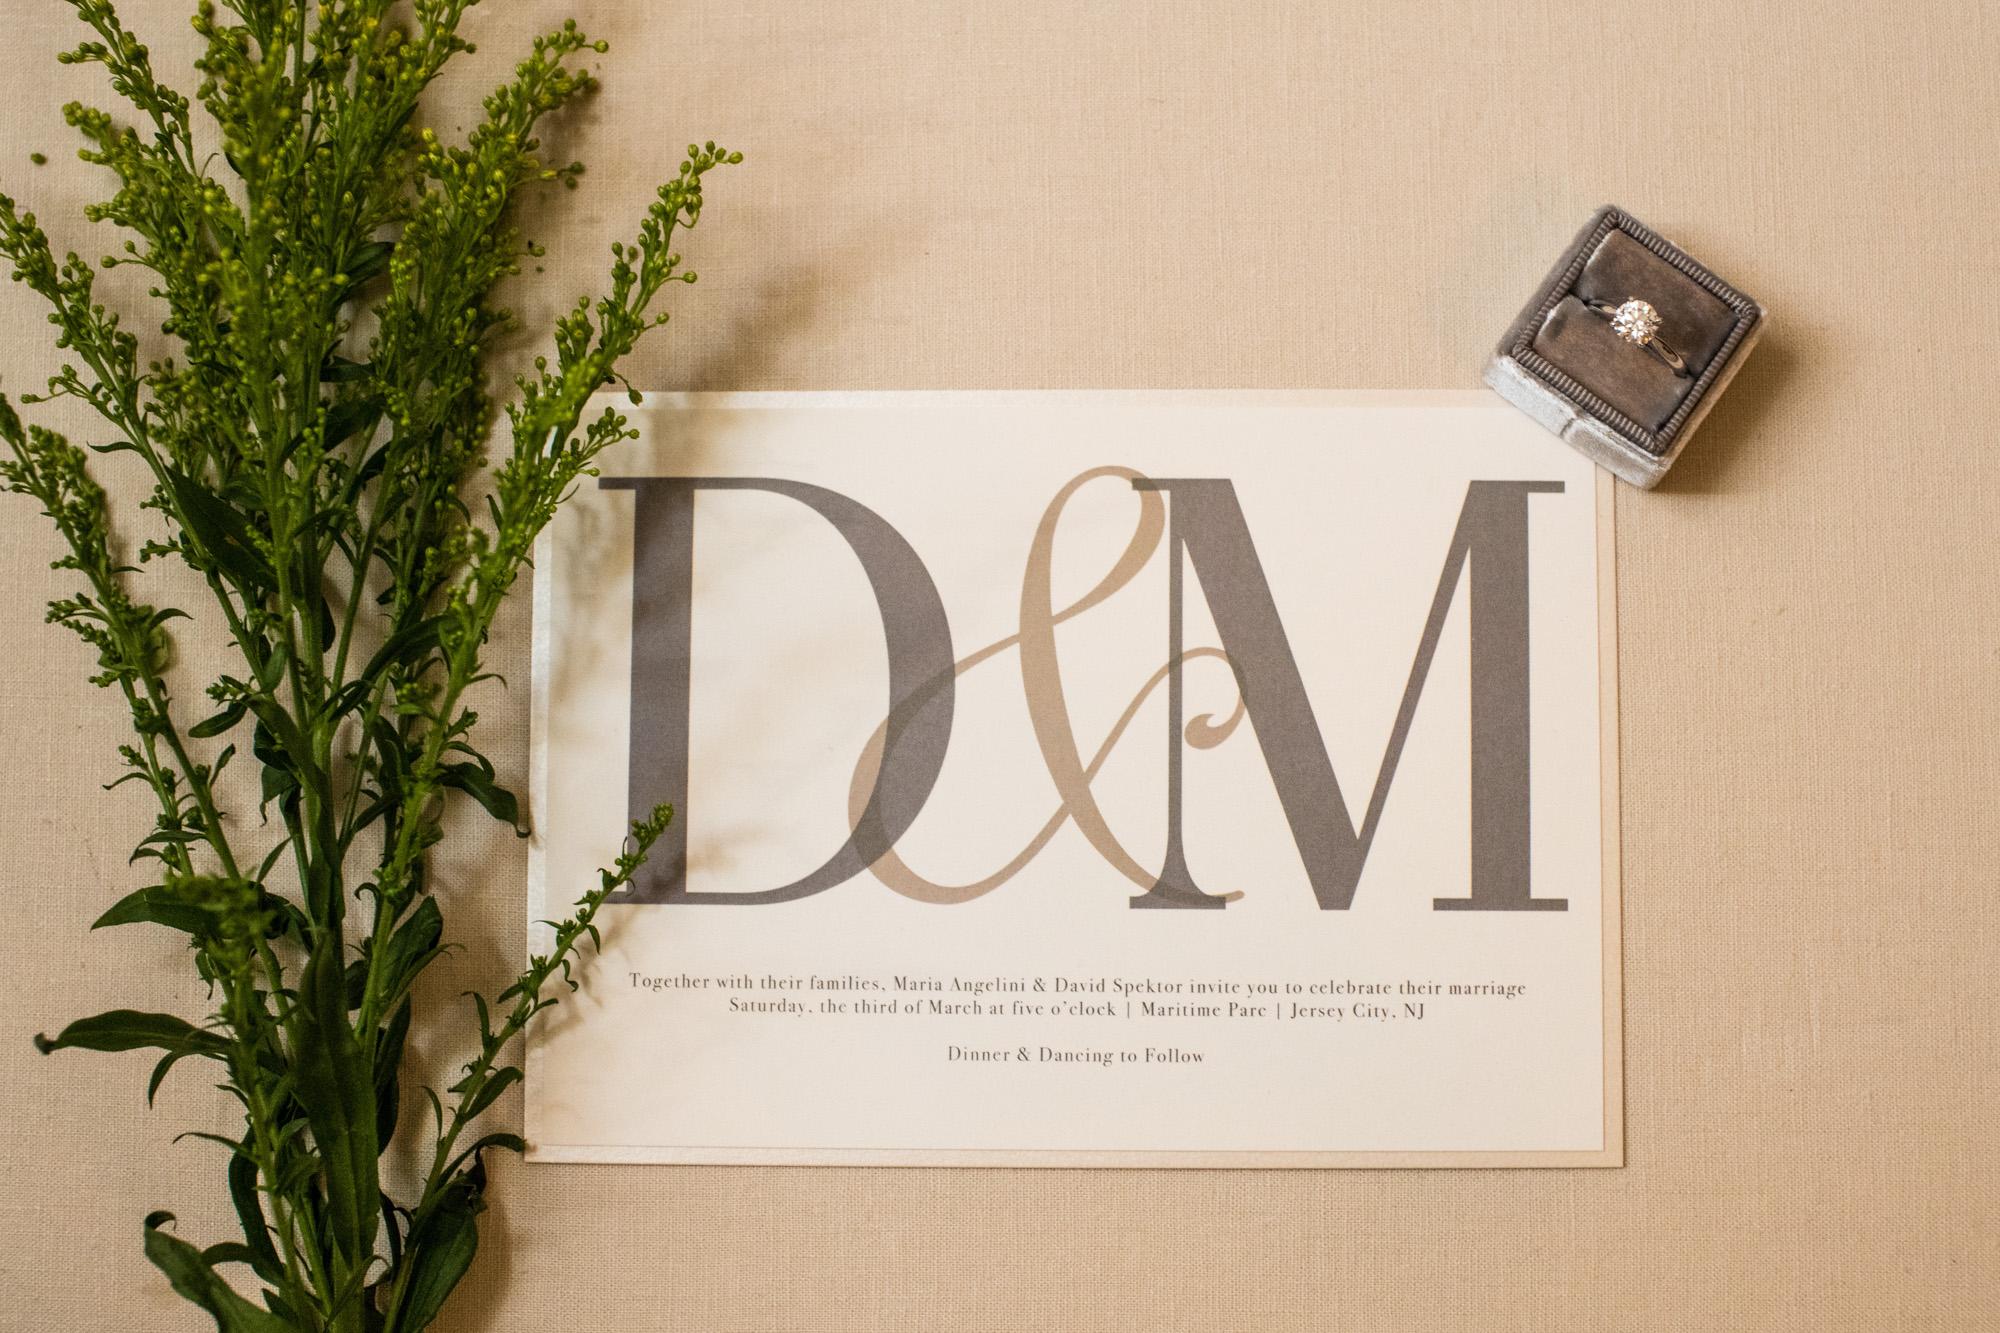 nj-wedding-photographer-maritime-parc-maria-david-1.jpg